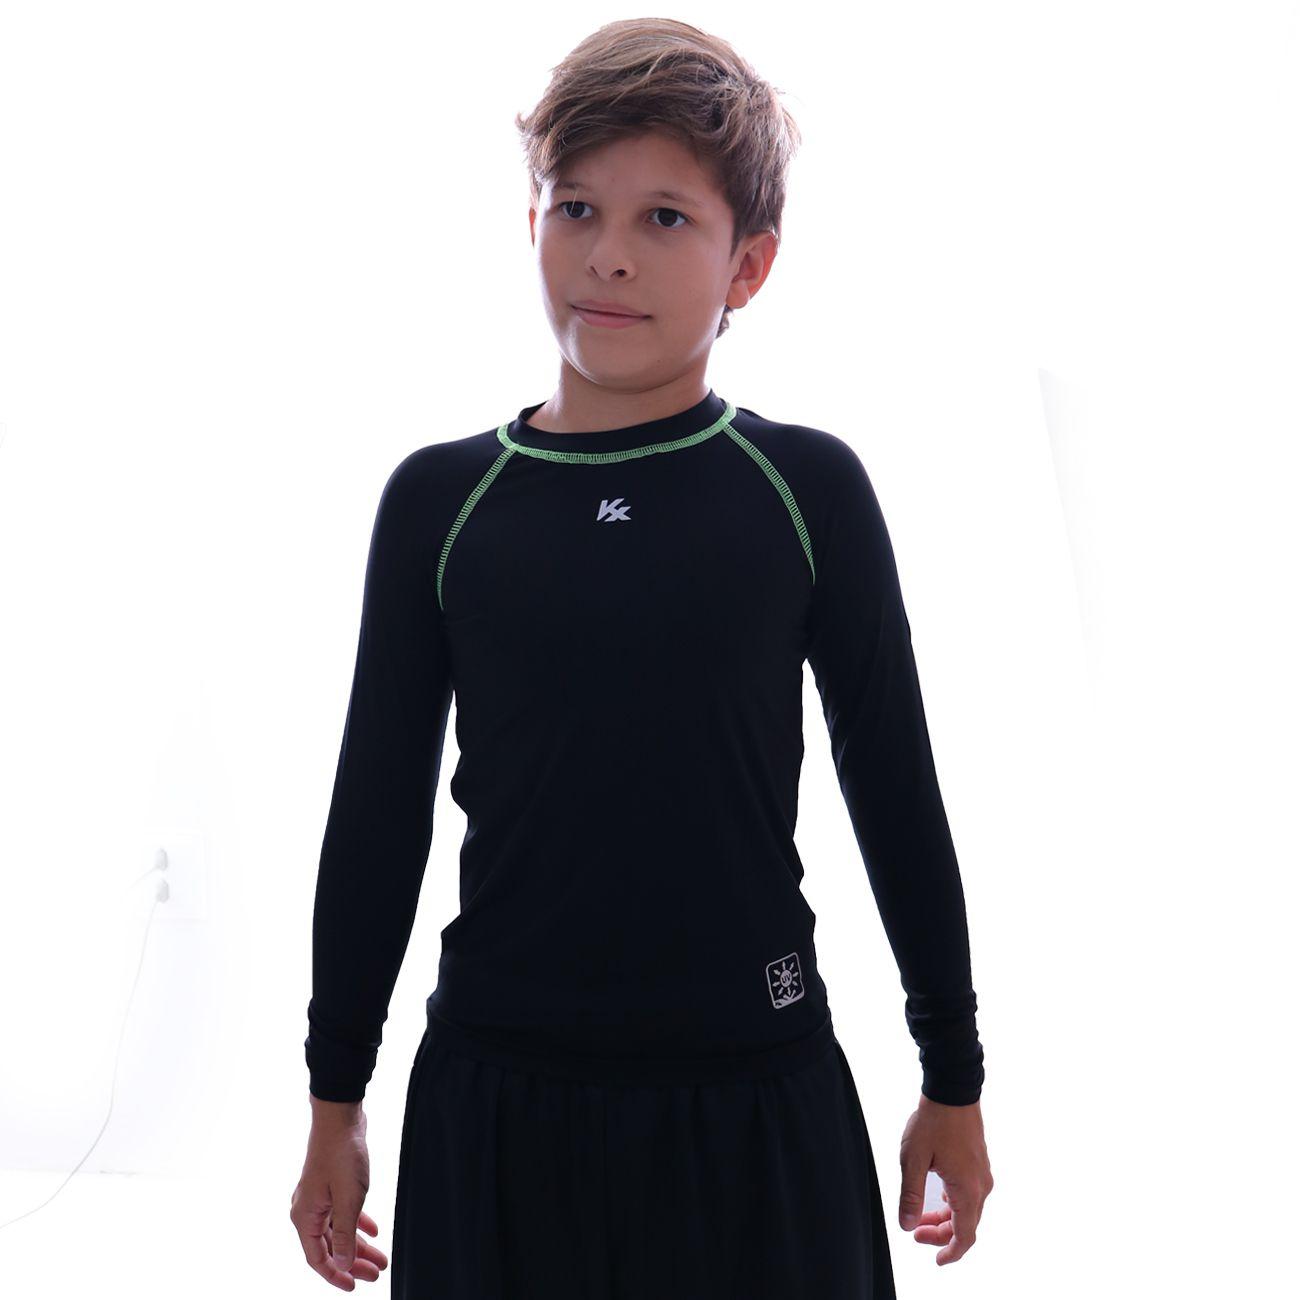 Camiseta Kanxa Protection M/l Infantil Preto